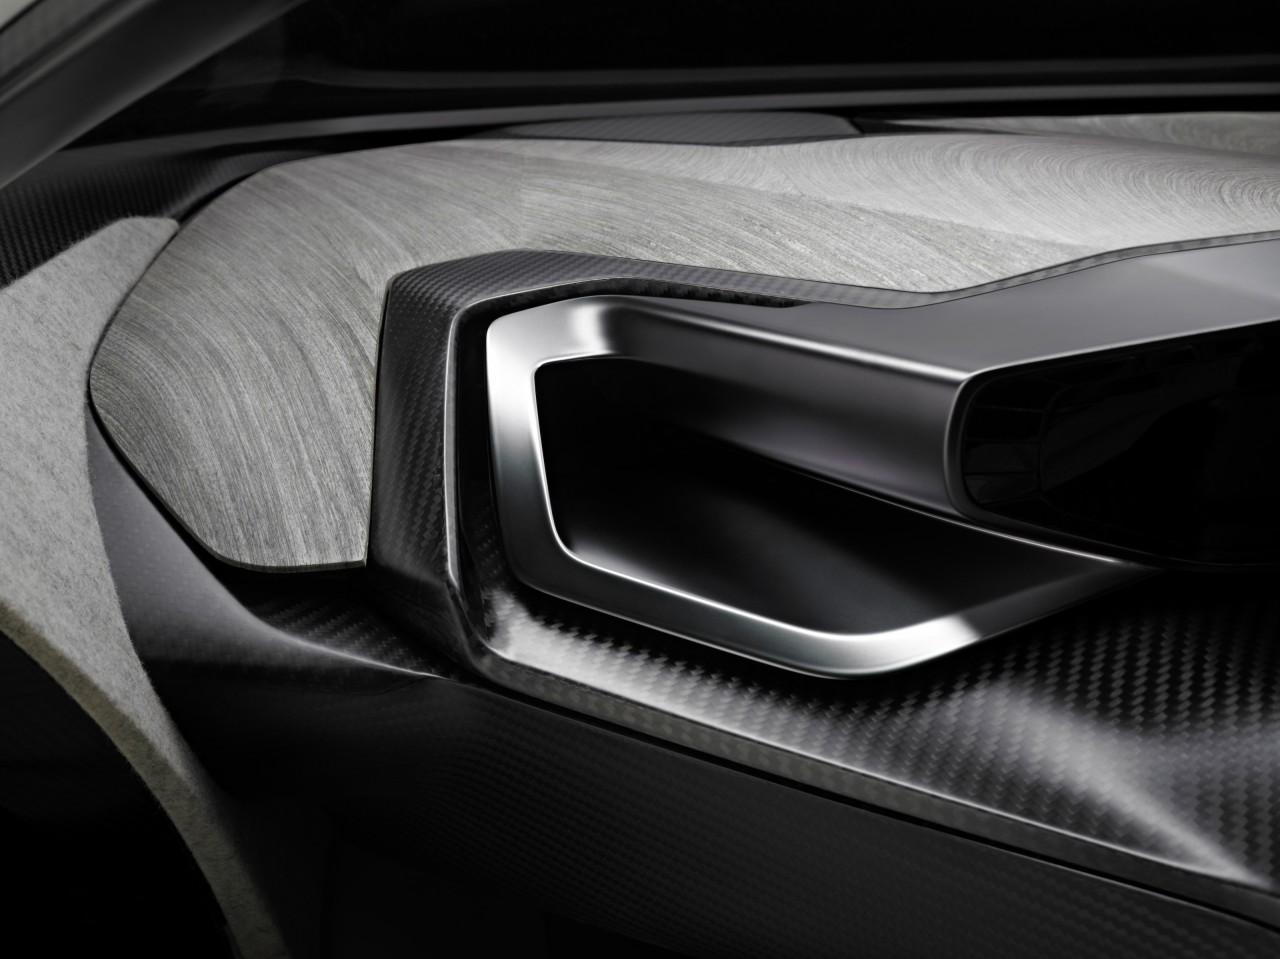 Cardesign.ru - The main resource of the vehicle design. Design cars. Portfolio. Photos. Projects. Design forum.